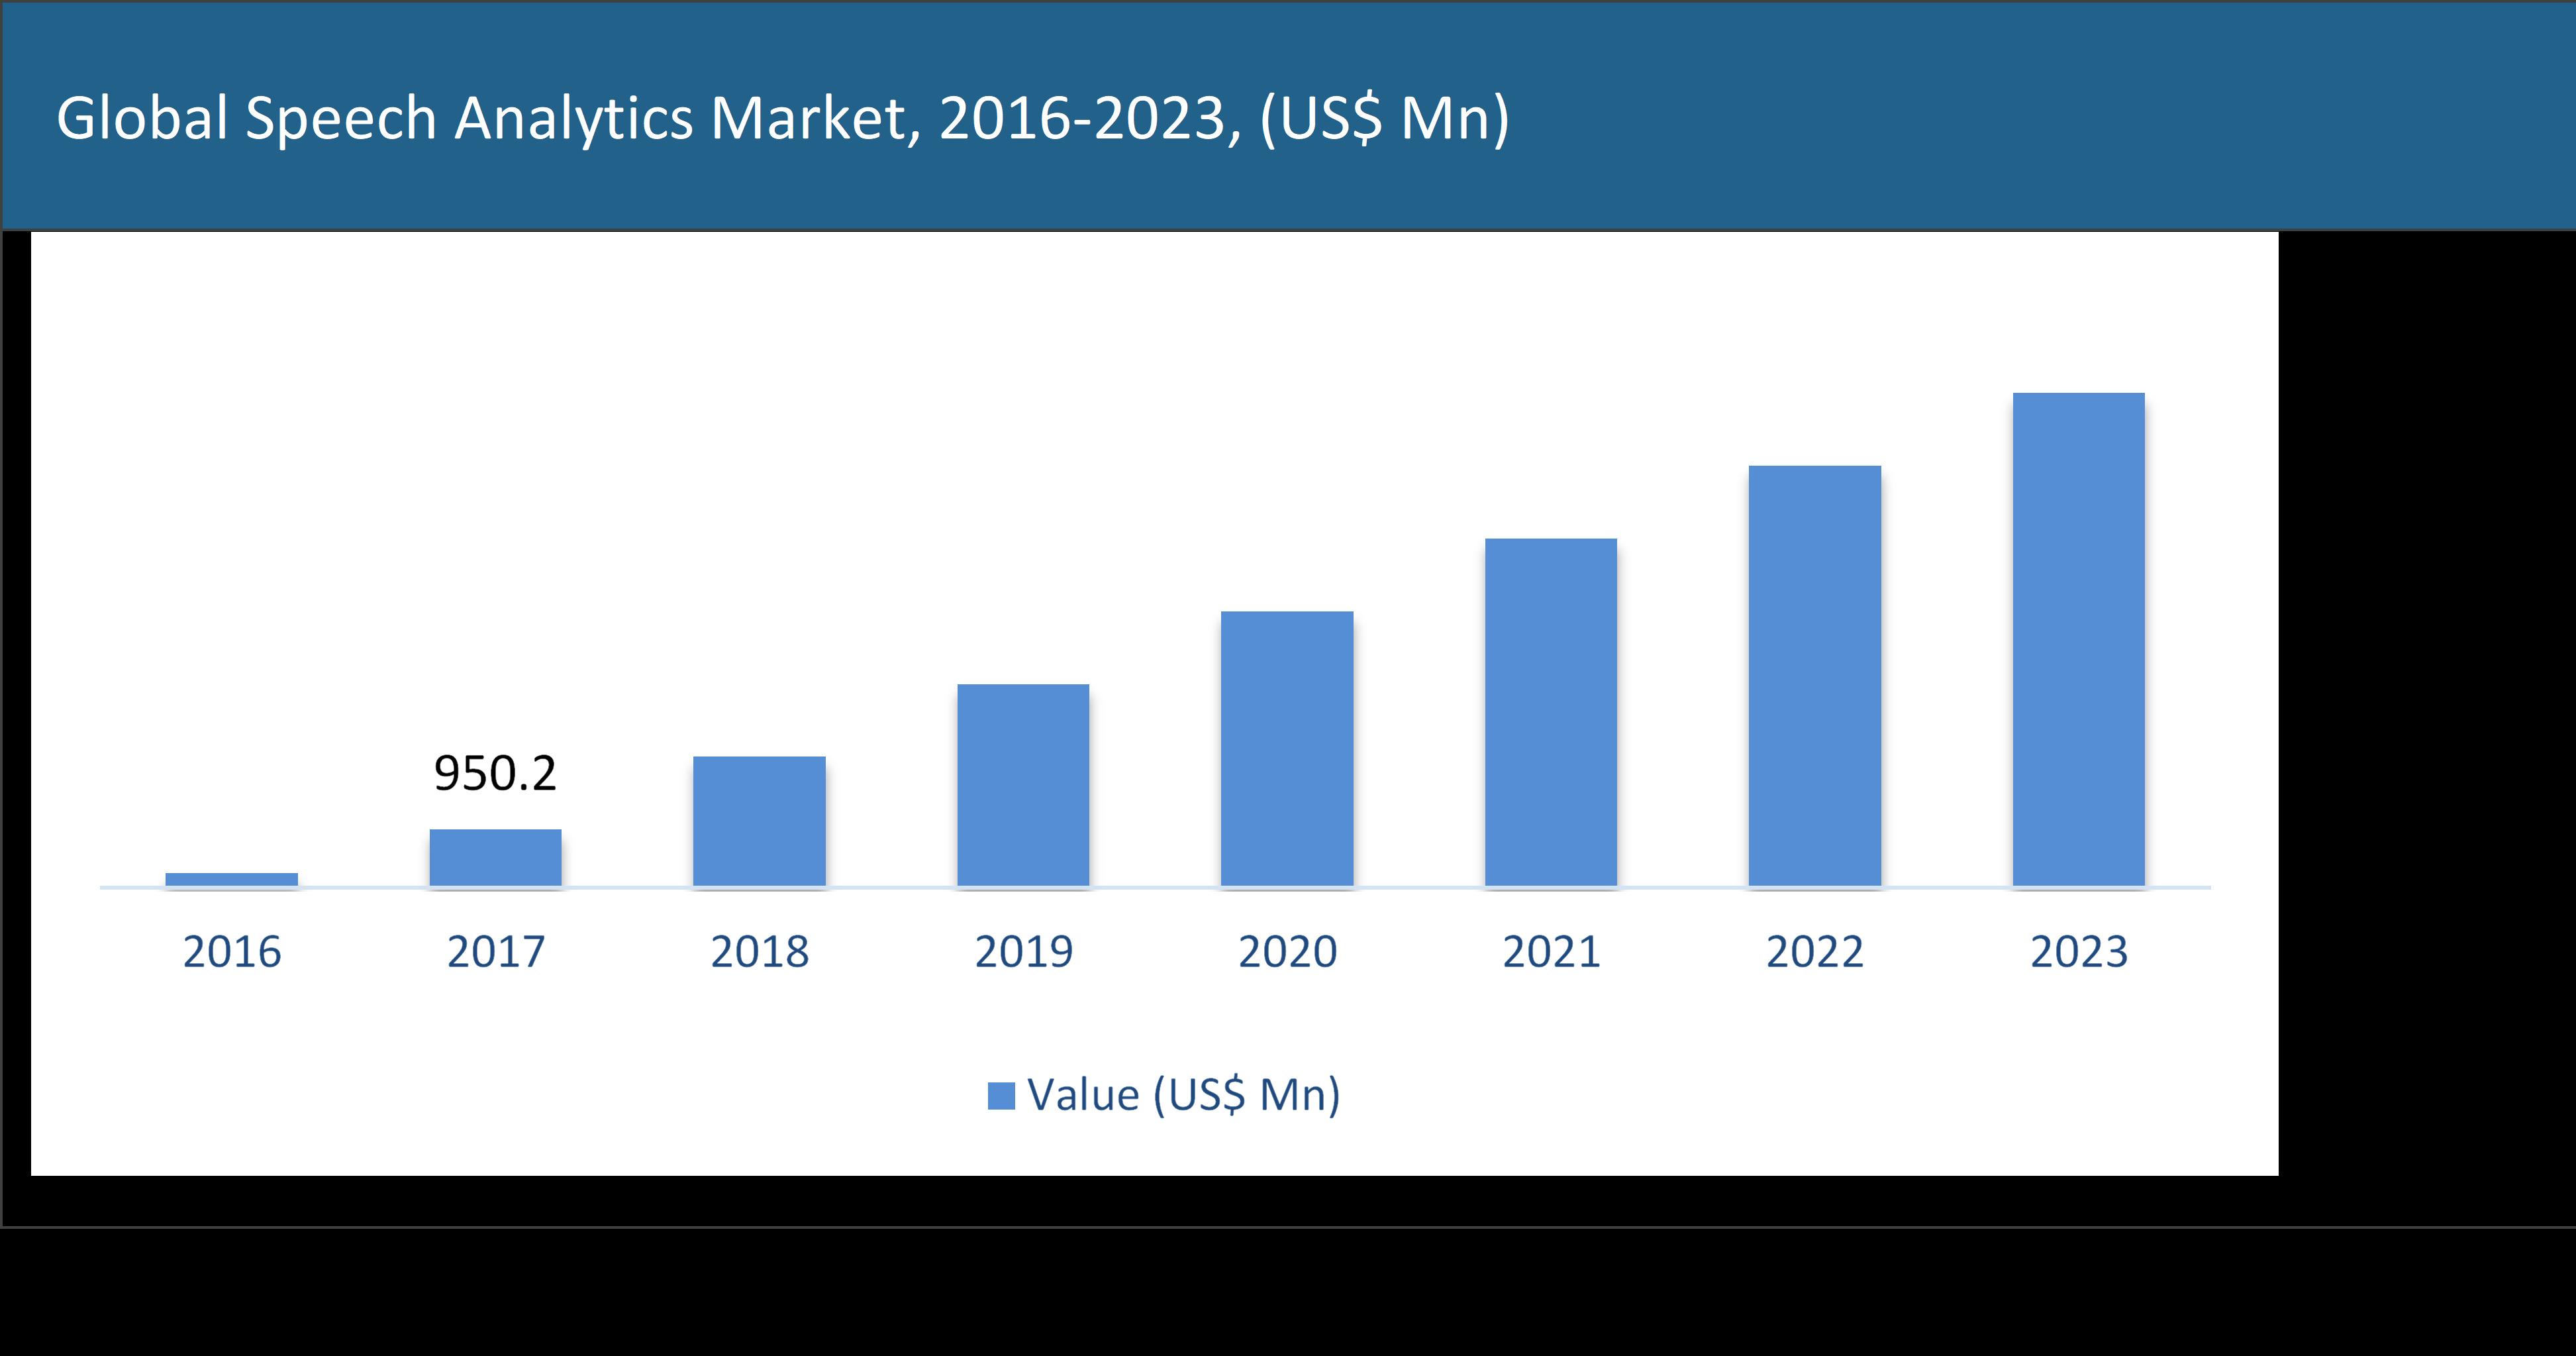 Global Speech Analytics Market